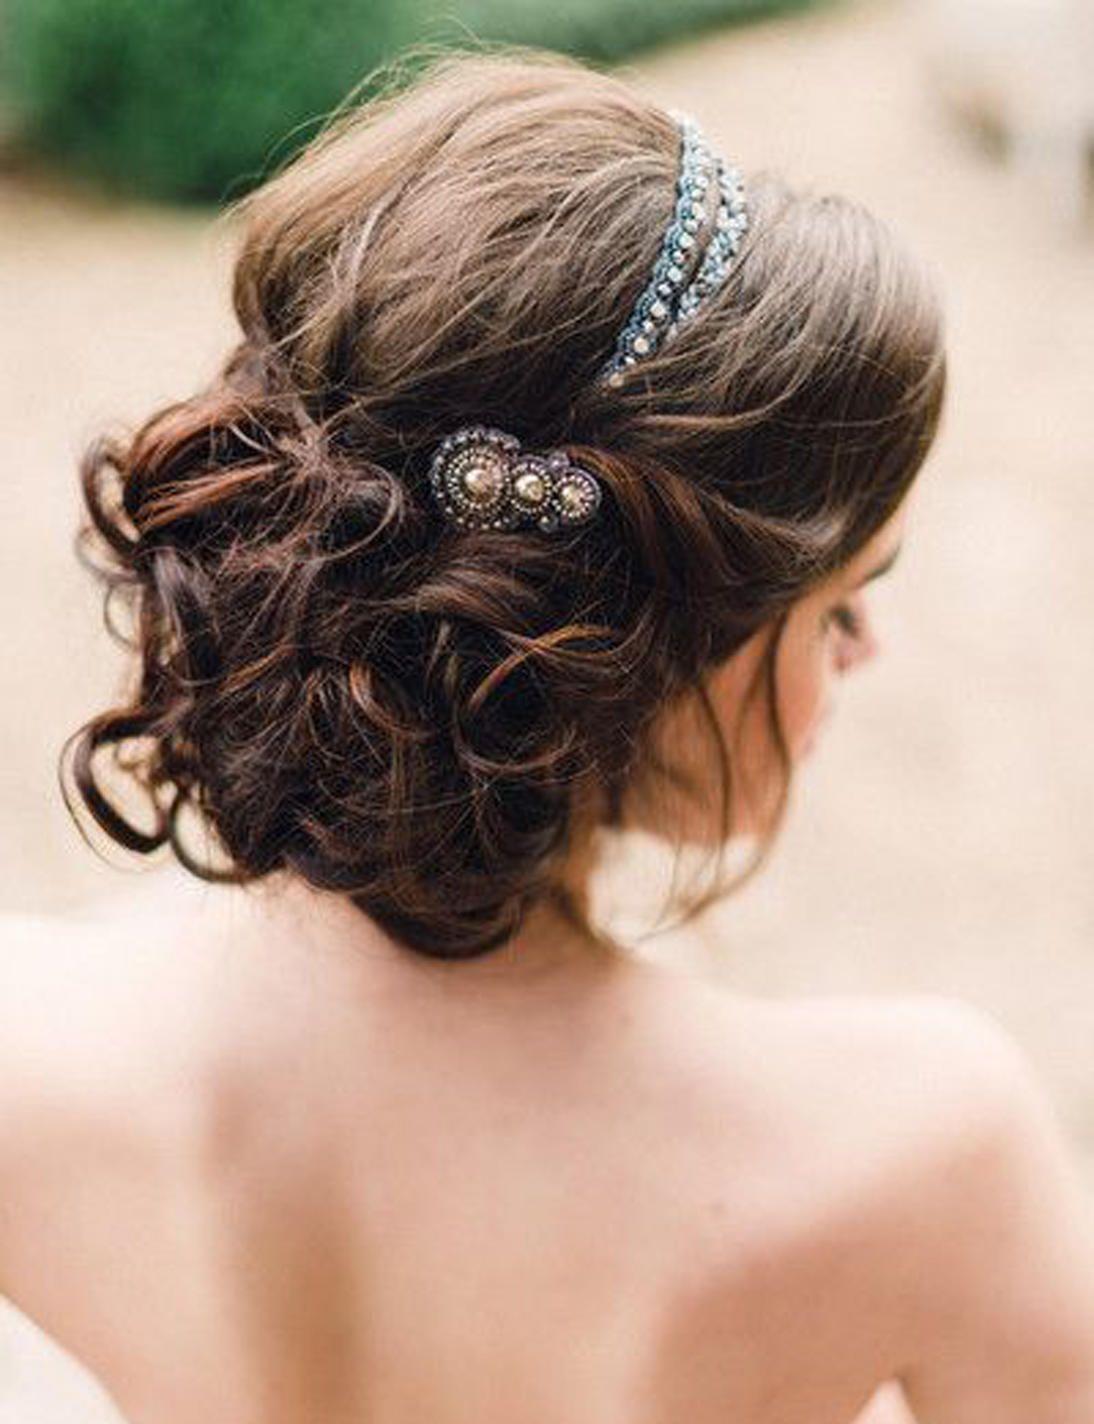 Coiffure De Mariage Featured Hairstyle Elstile Www Elstile Com Coiffure Mariage Inspiration Coiffure Mariage Coiffure Mariee